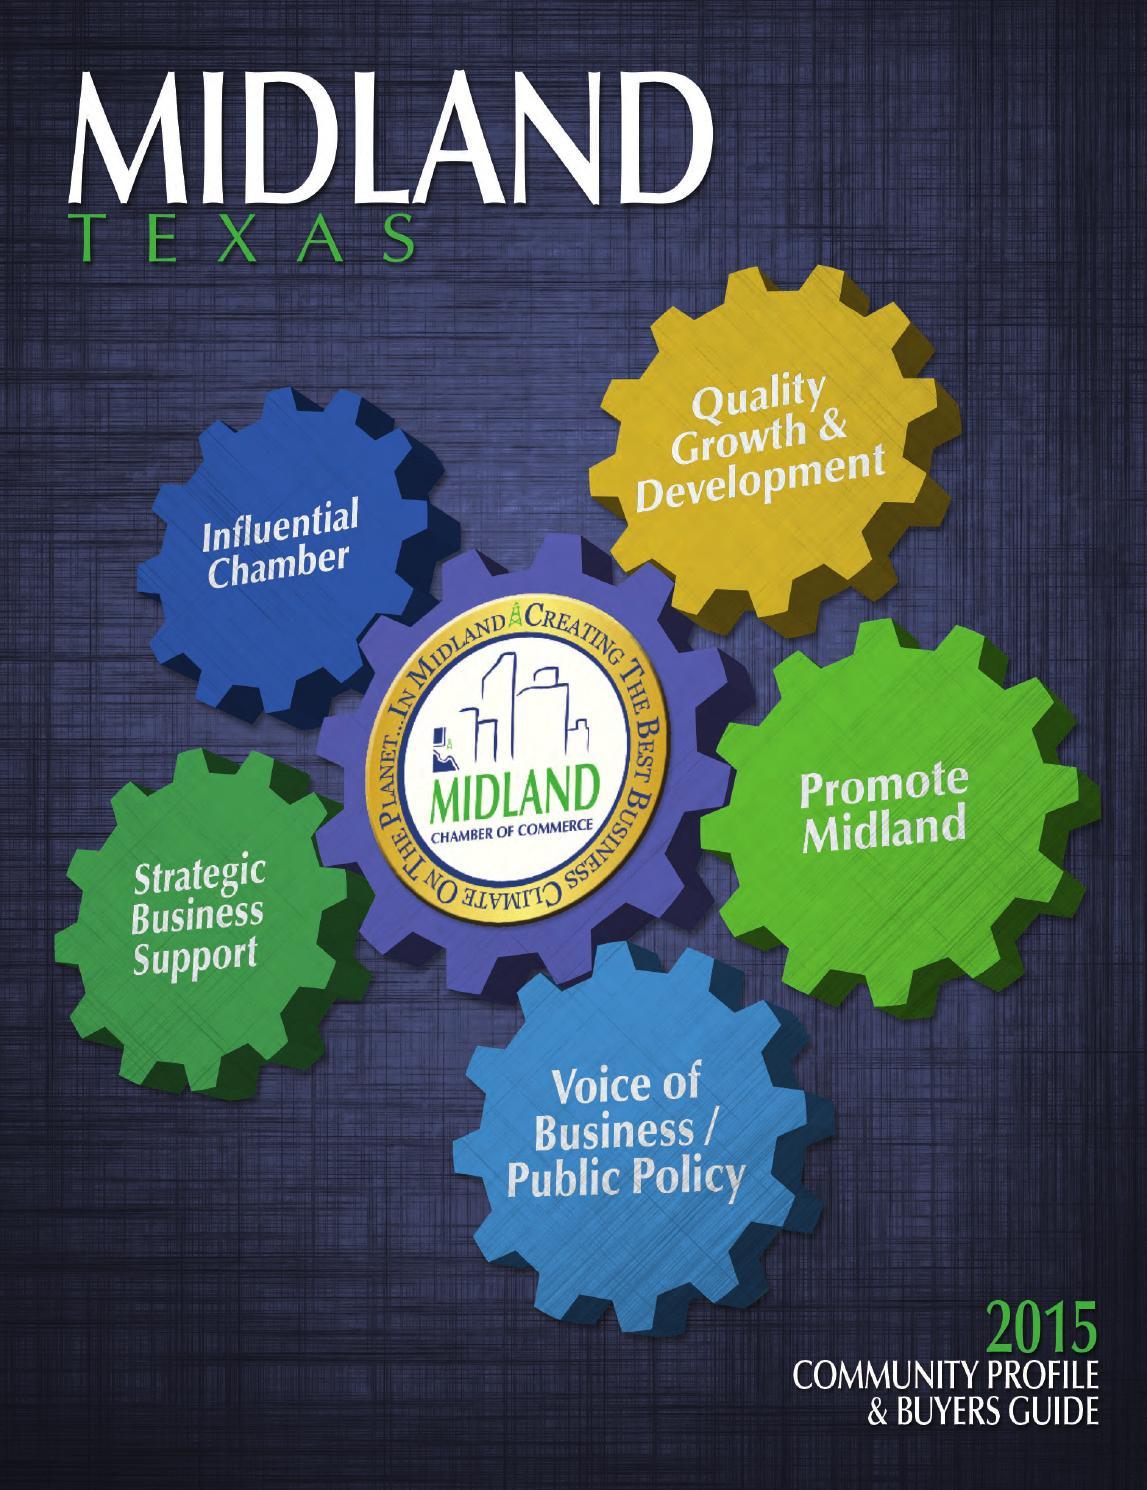 Midland Tx 2015 Community Profile And Buyers Guide By Tivoli Design Ttec4841 Electrical Corey Leonard April 2011 Media Group Issuu